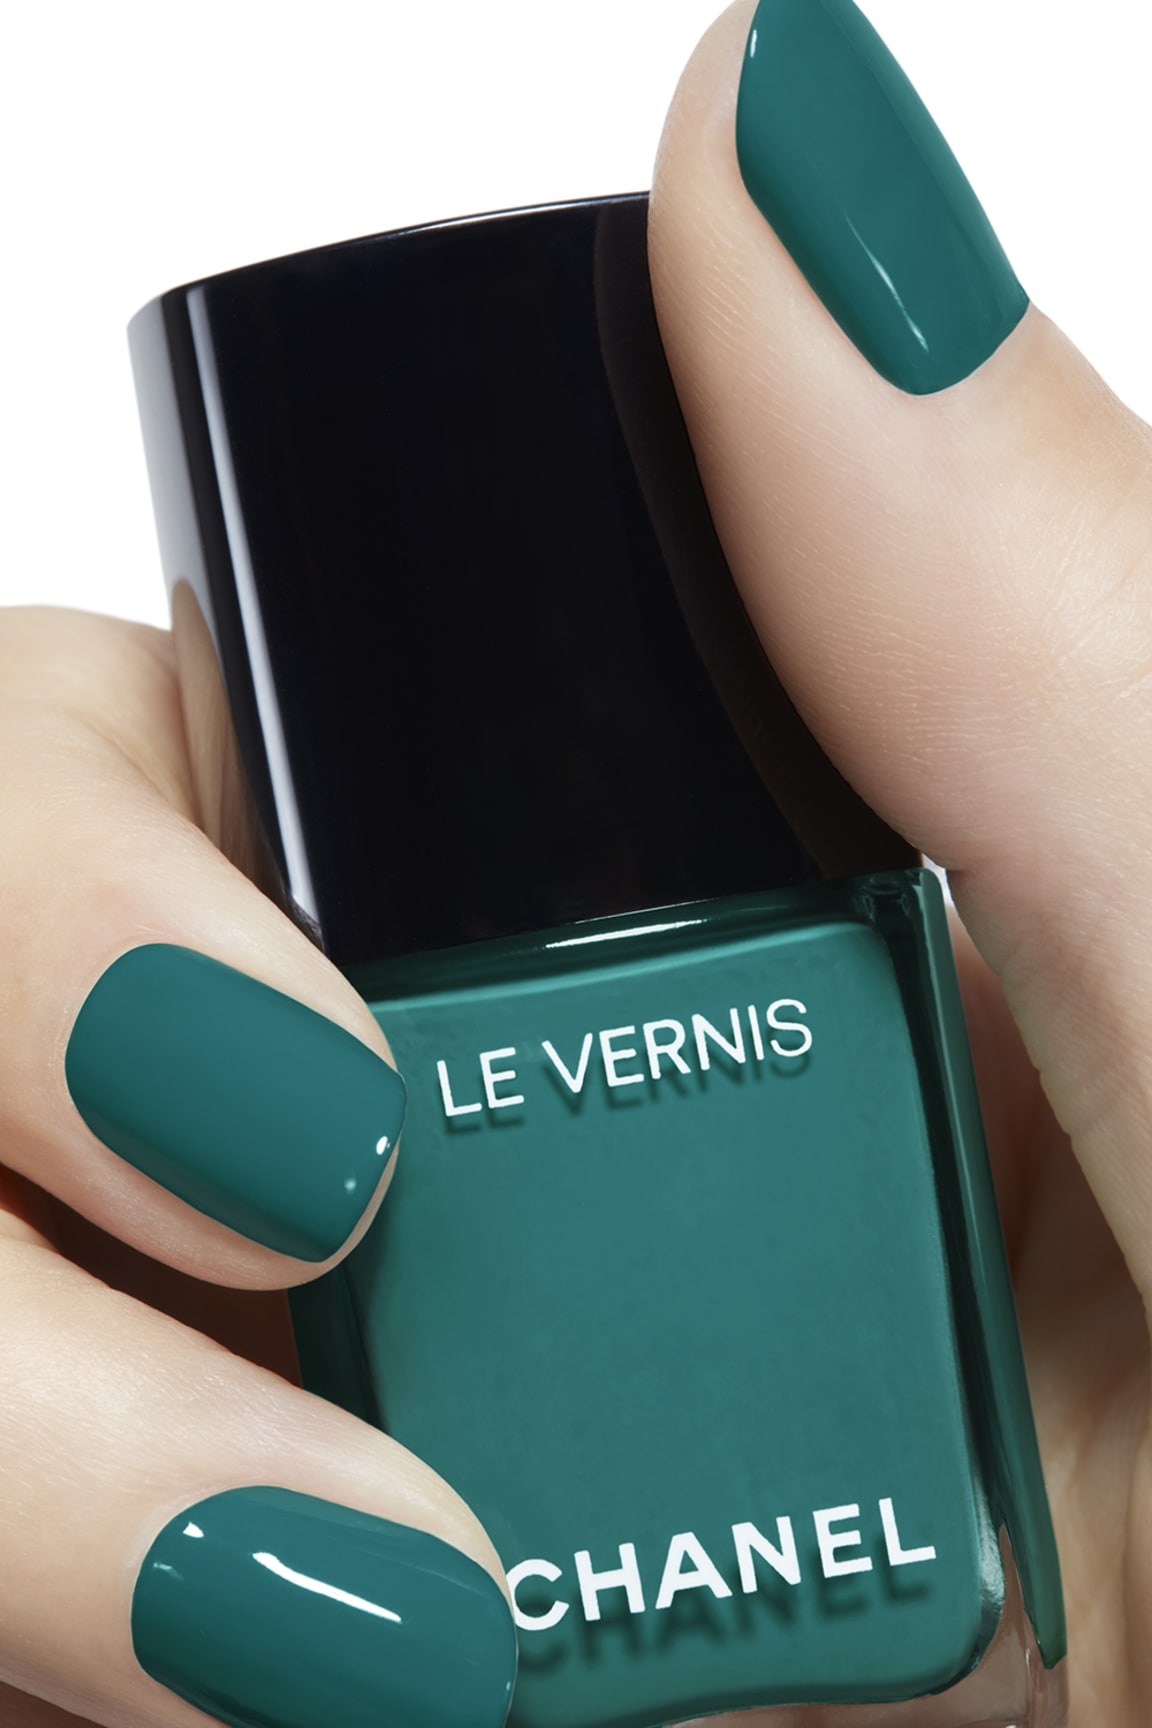 Пример нанесения макияжа 2 - LE VERNIS 755 - HARMONY